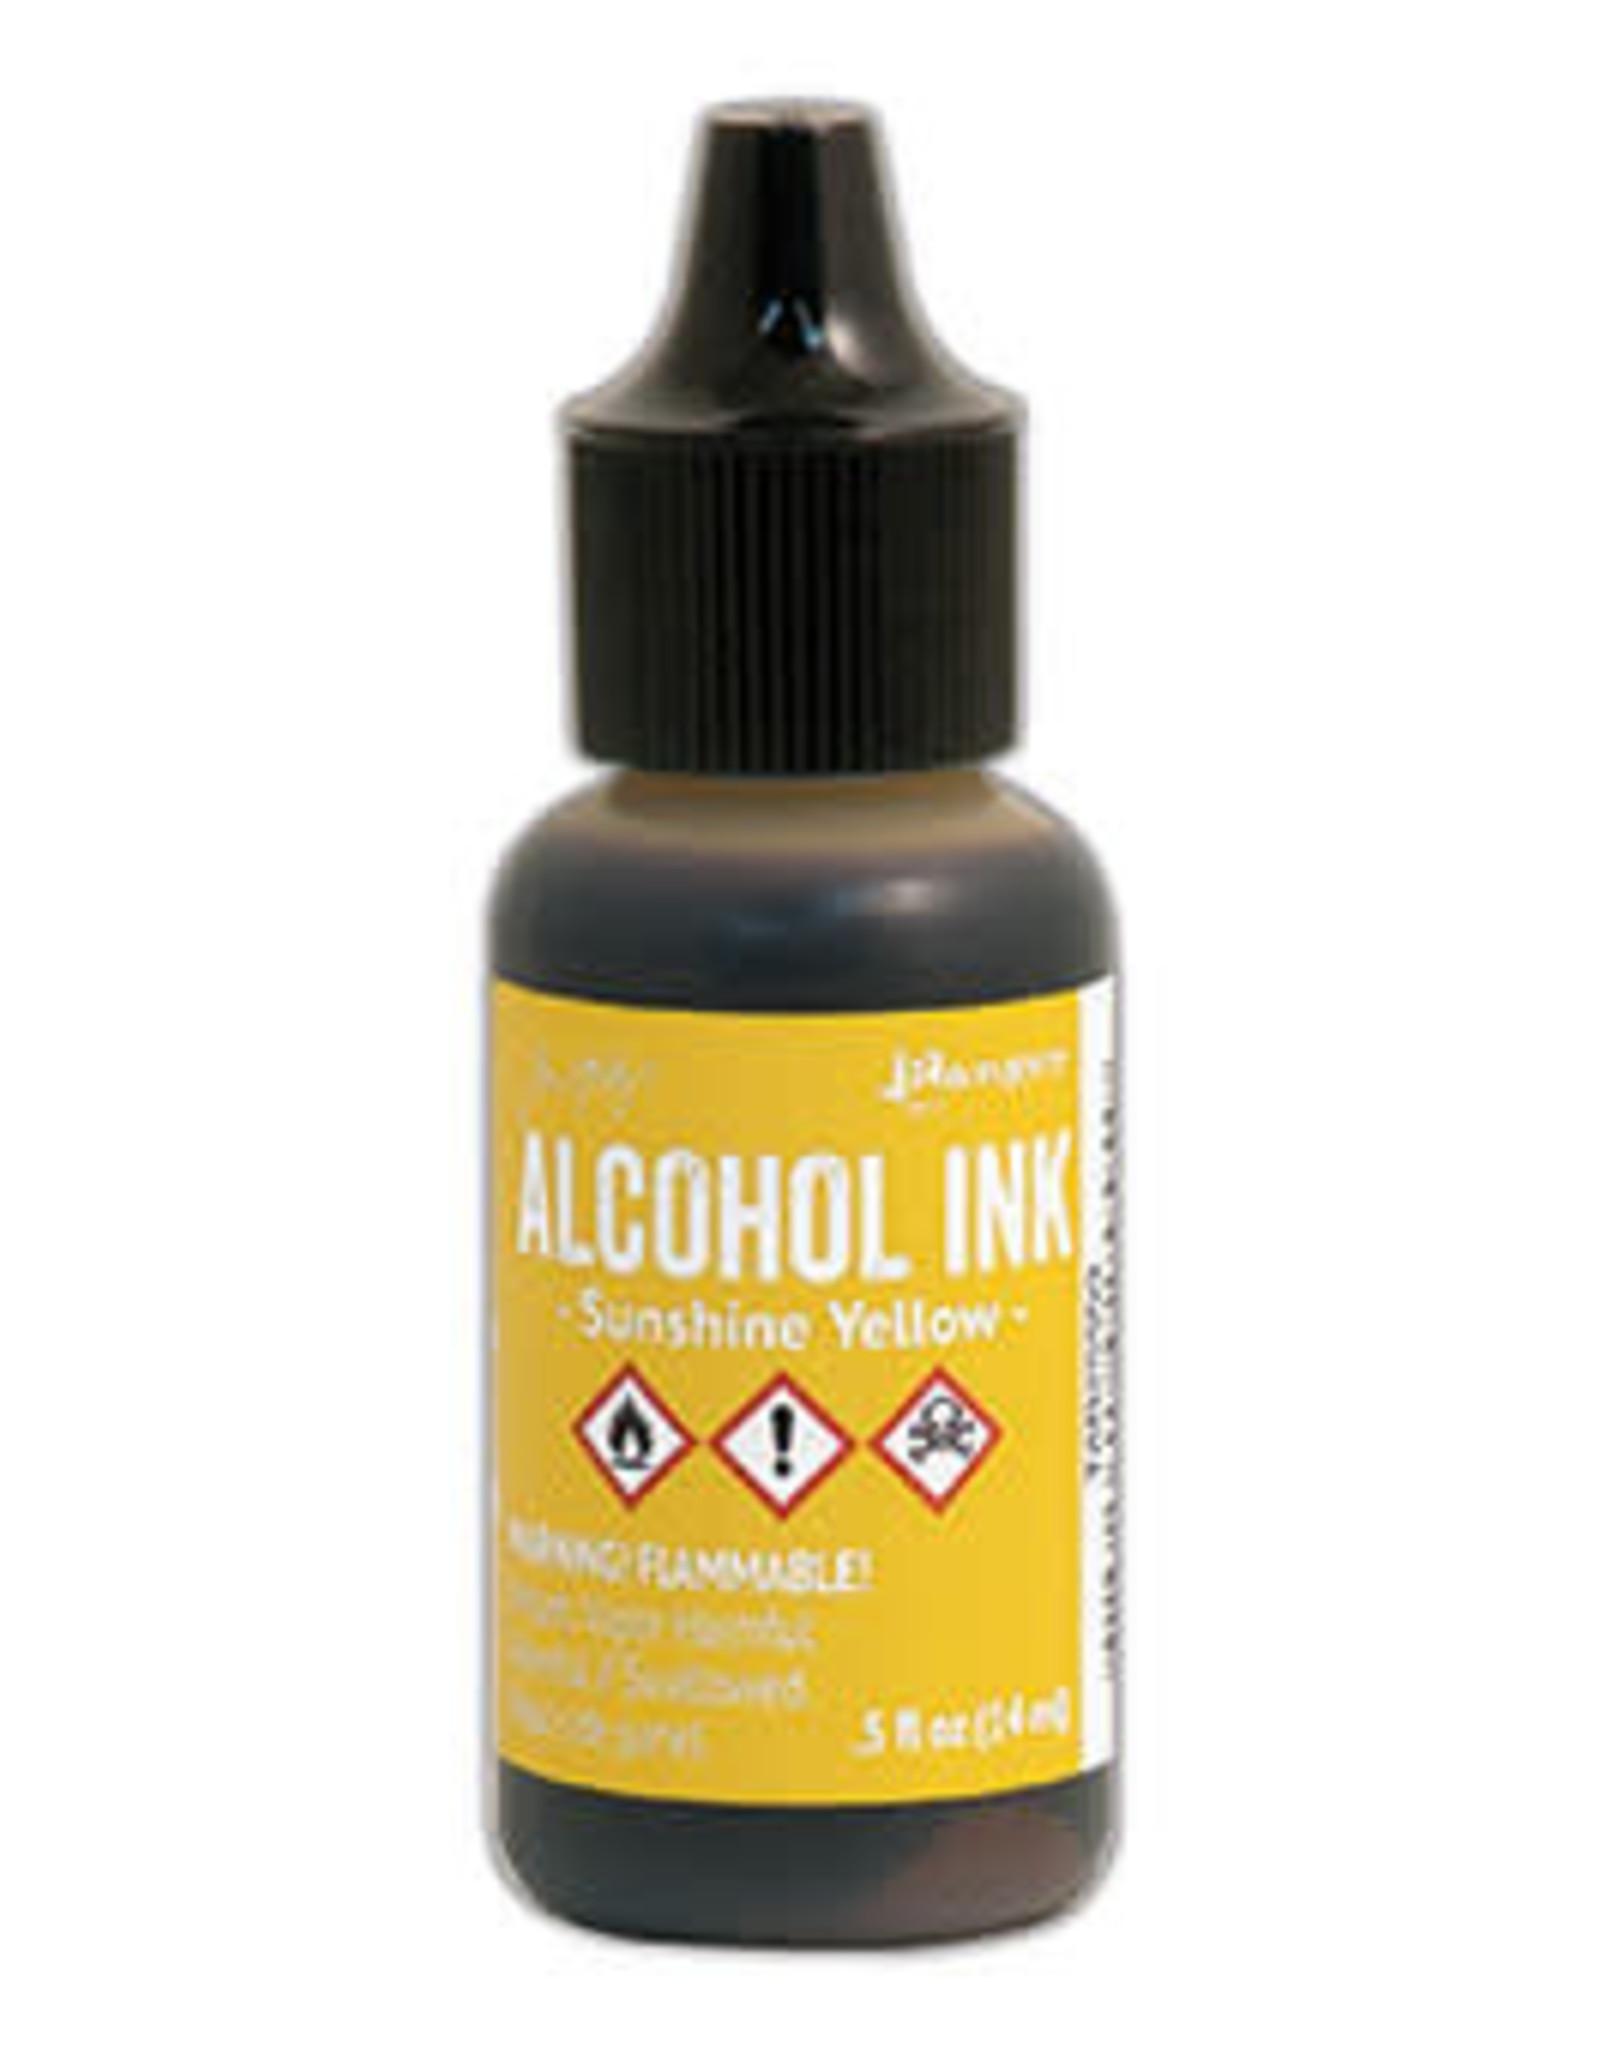 Tim Holtz Alcohol Ink 1/2 oz Sunshine Yellow